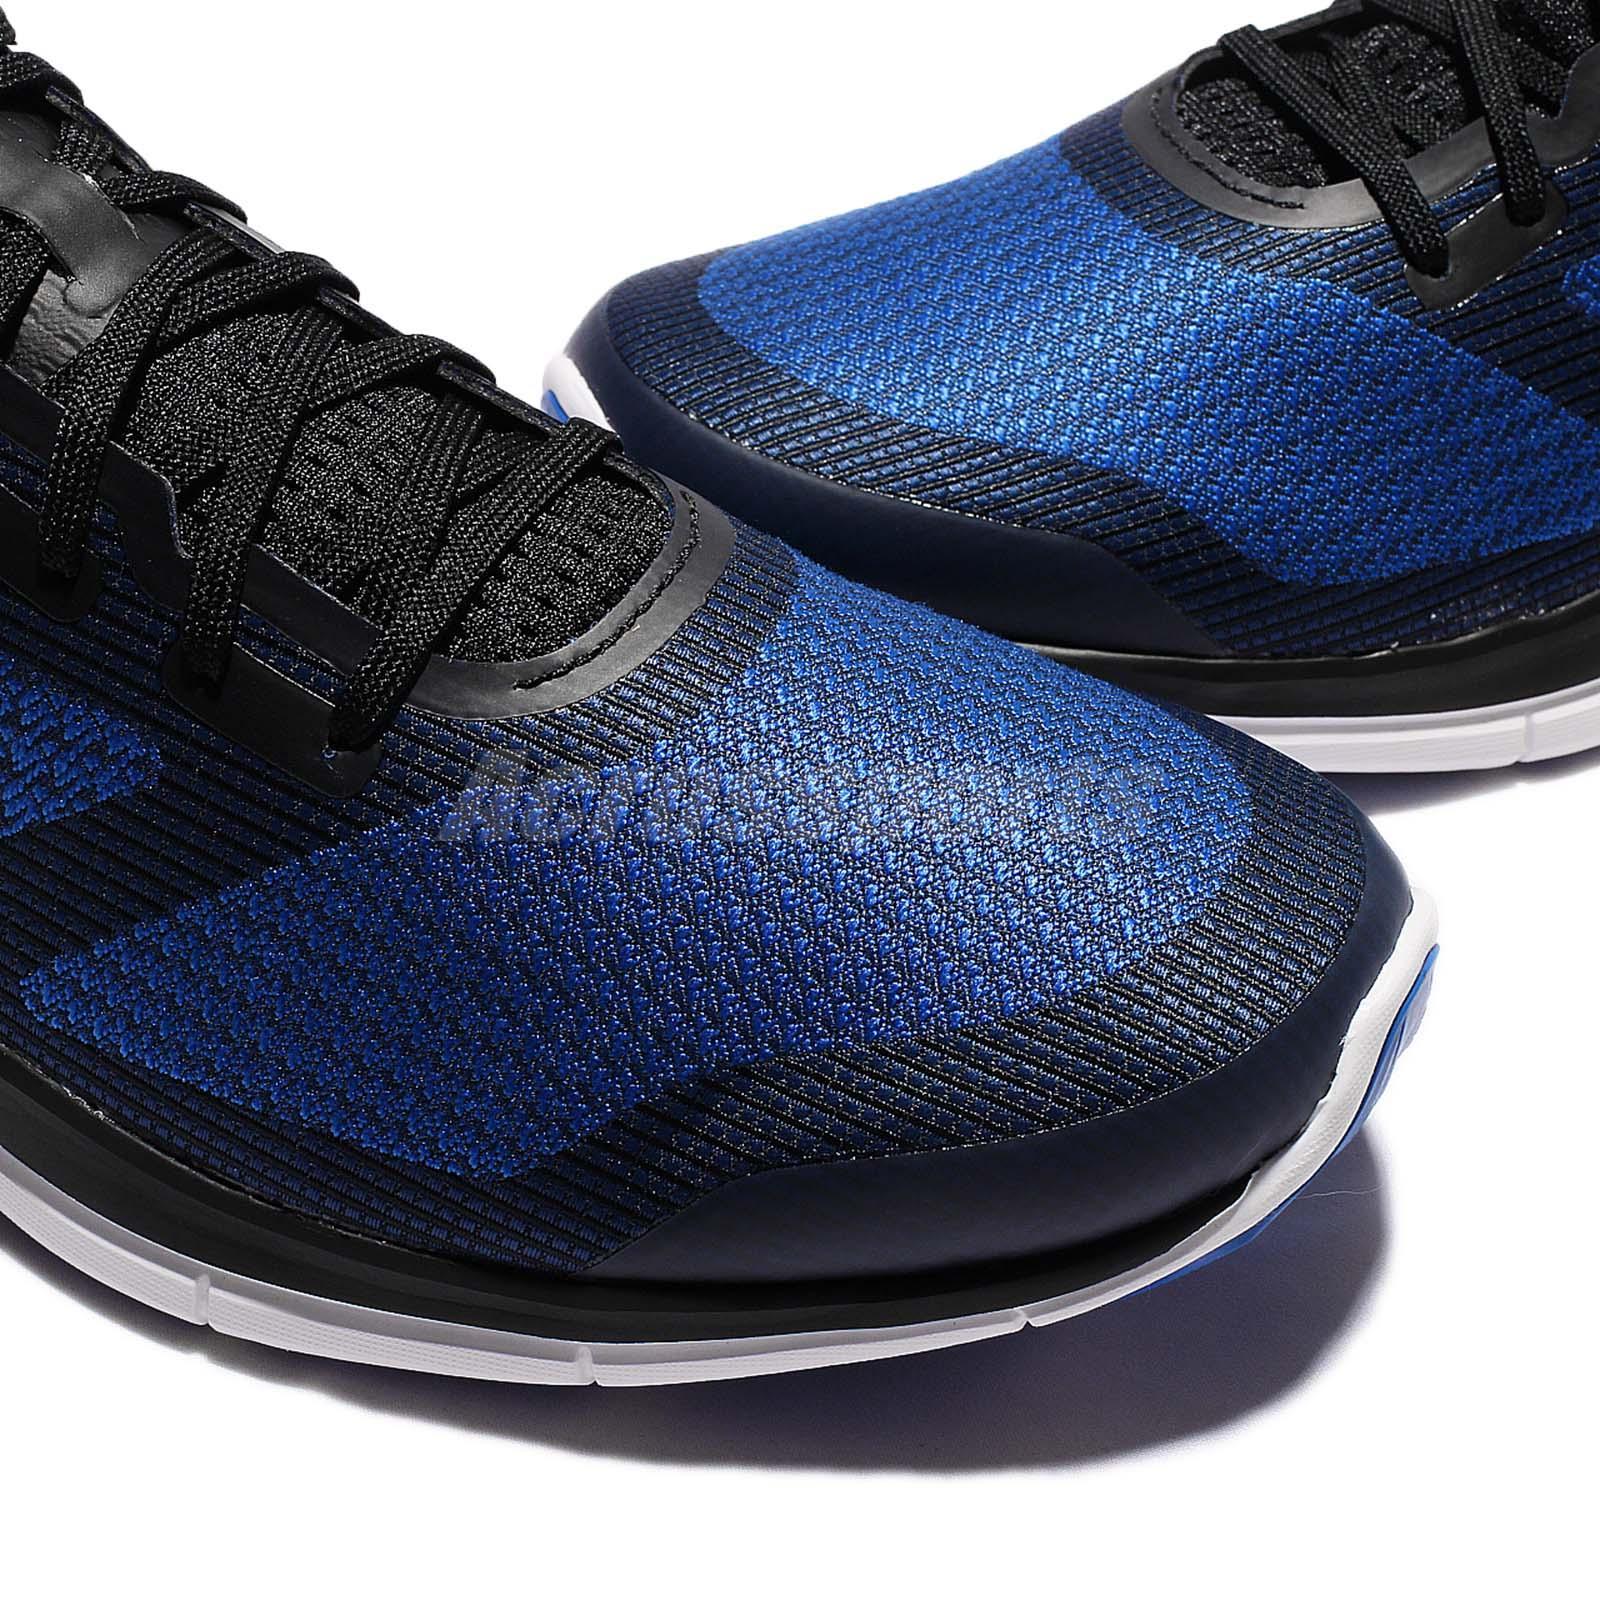 wholesale dealer 9f3ab 3fbdc blue jordans men for under  50 2014 Nike Air Jordan 14 XIV Retro ...